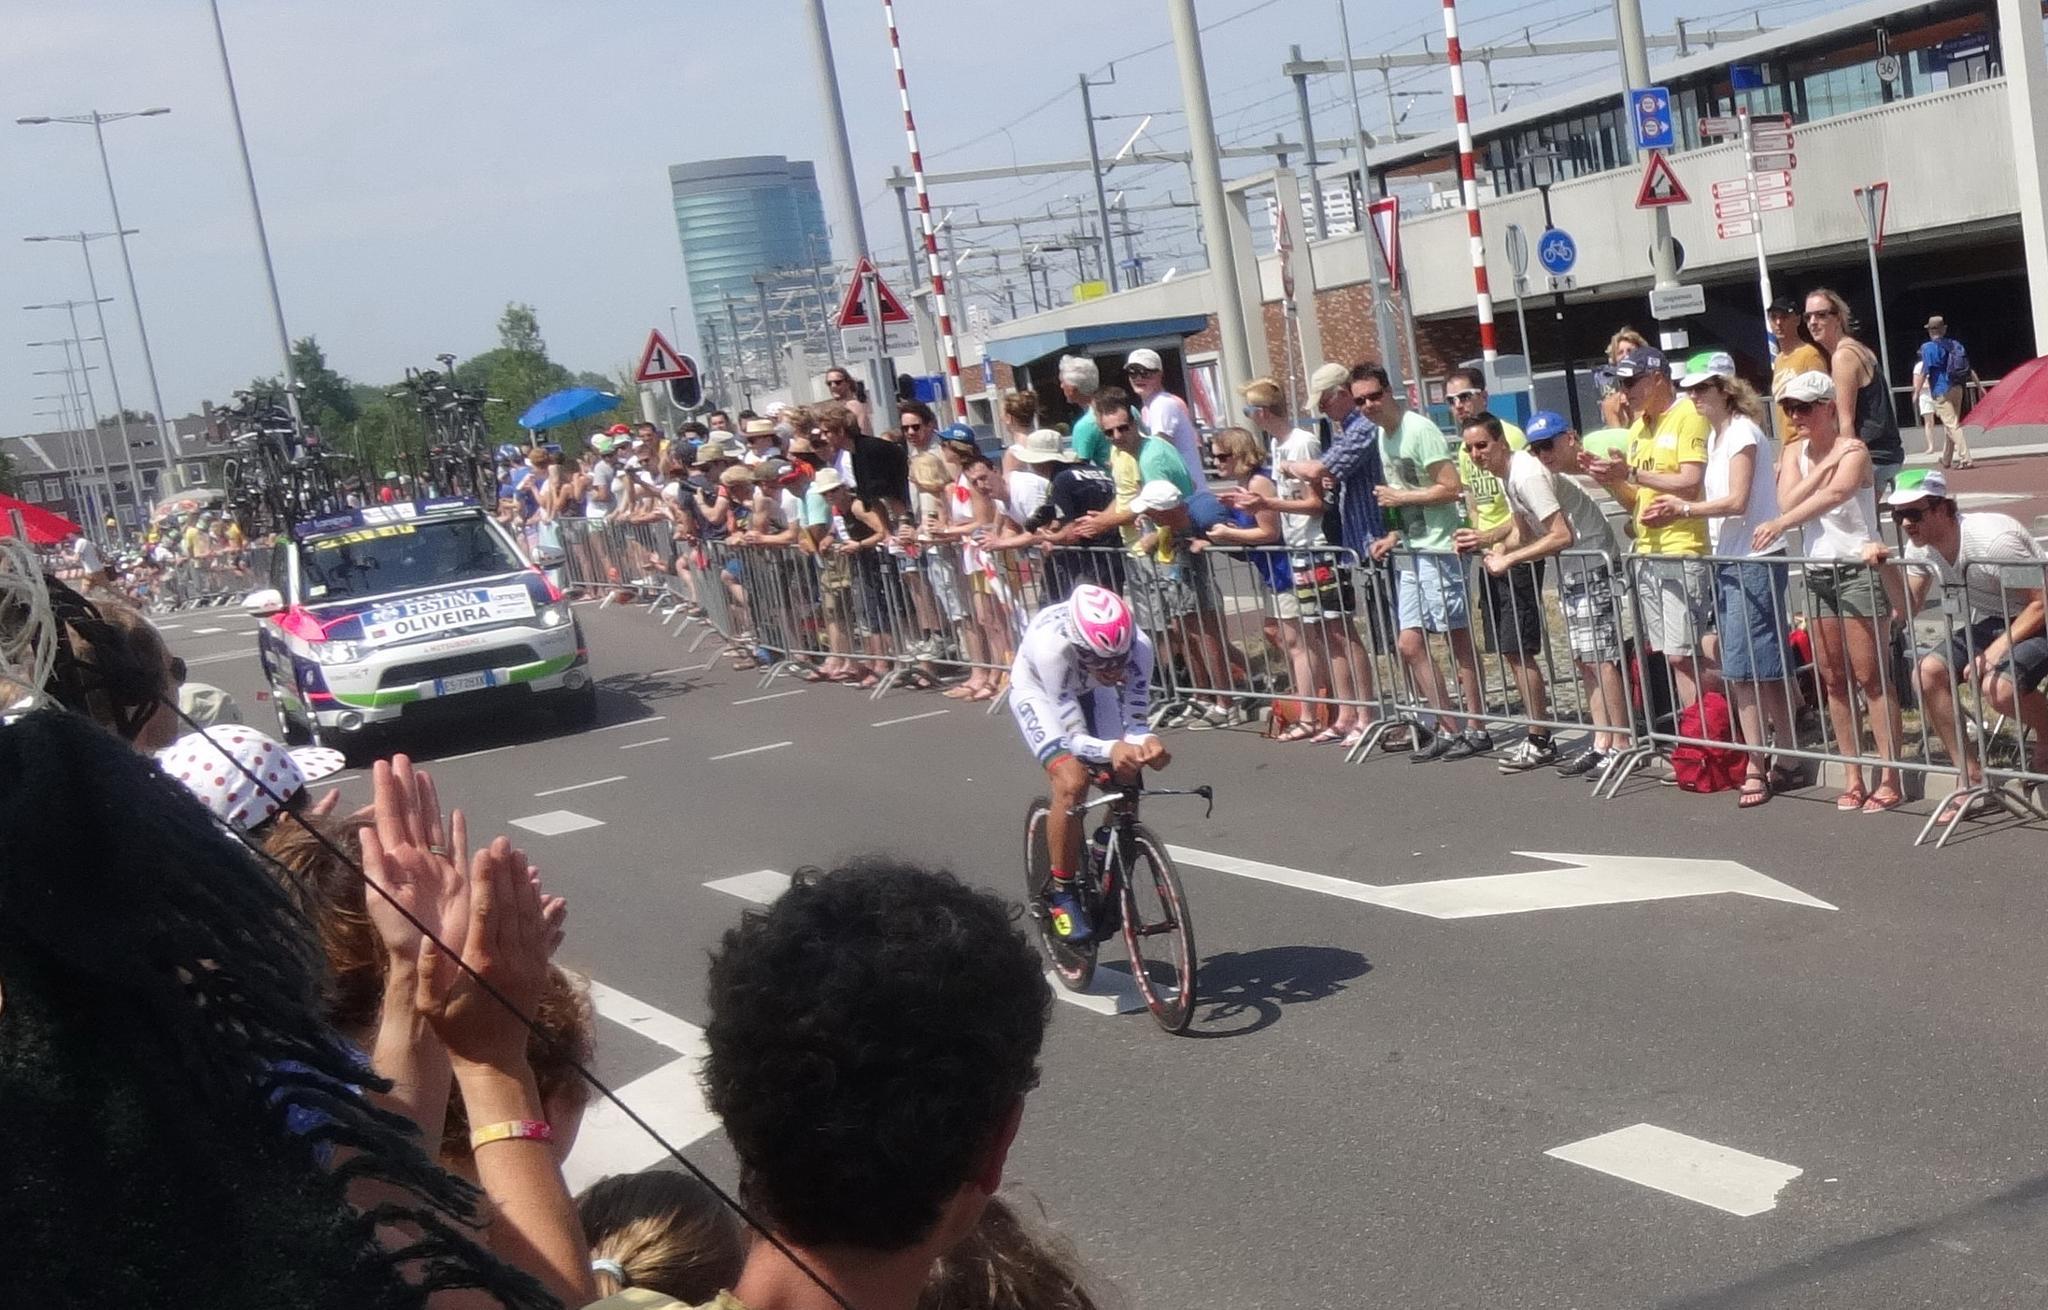 Start Tour de France in Utrecht 39 by H.Boorsma